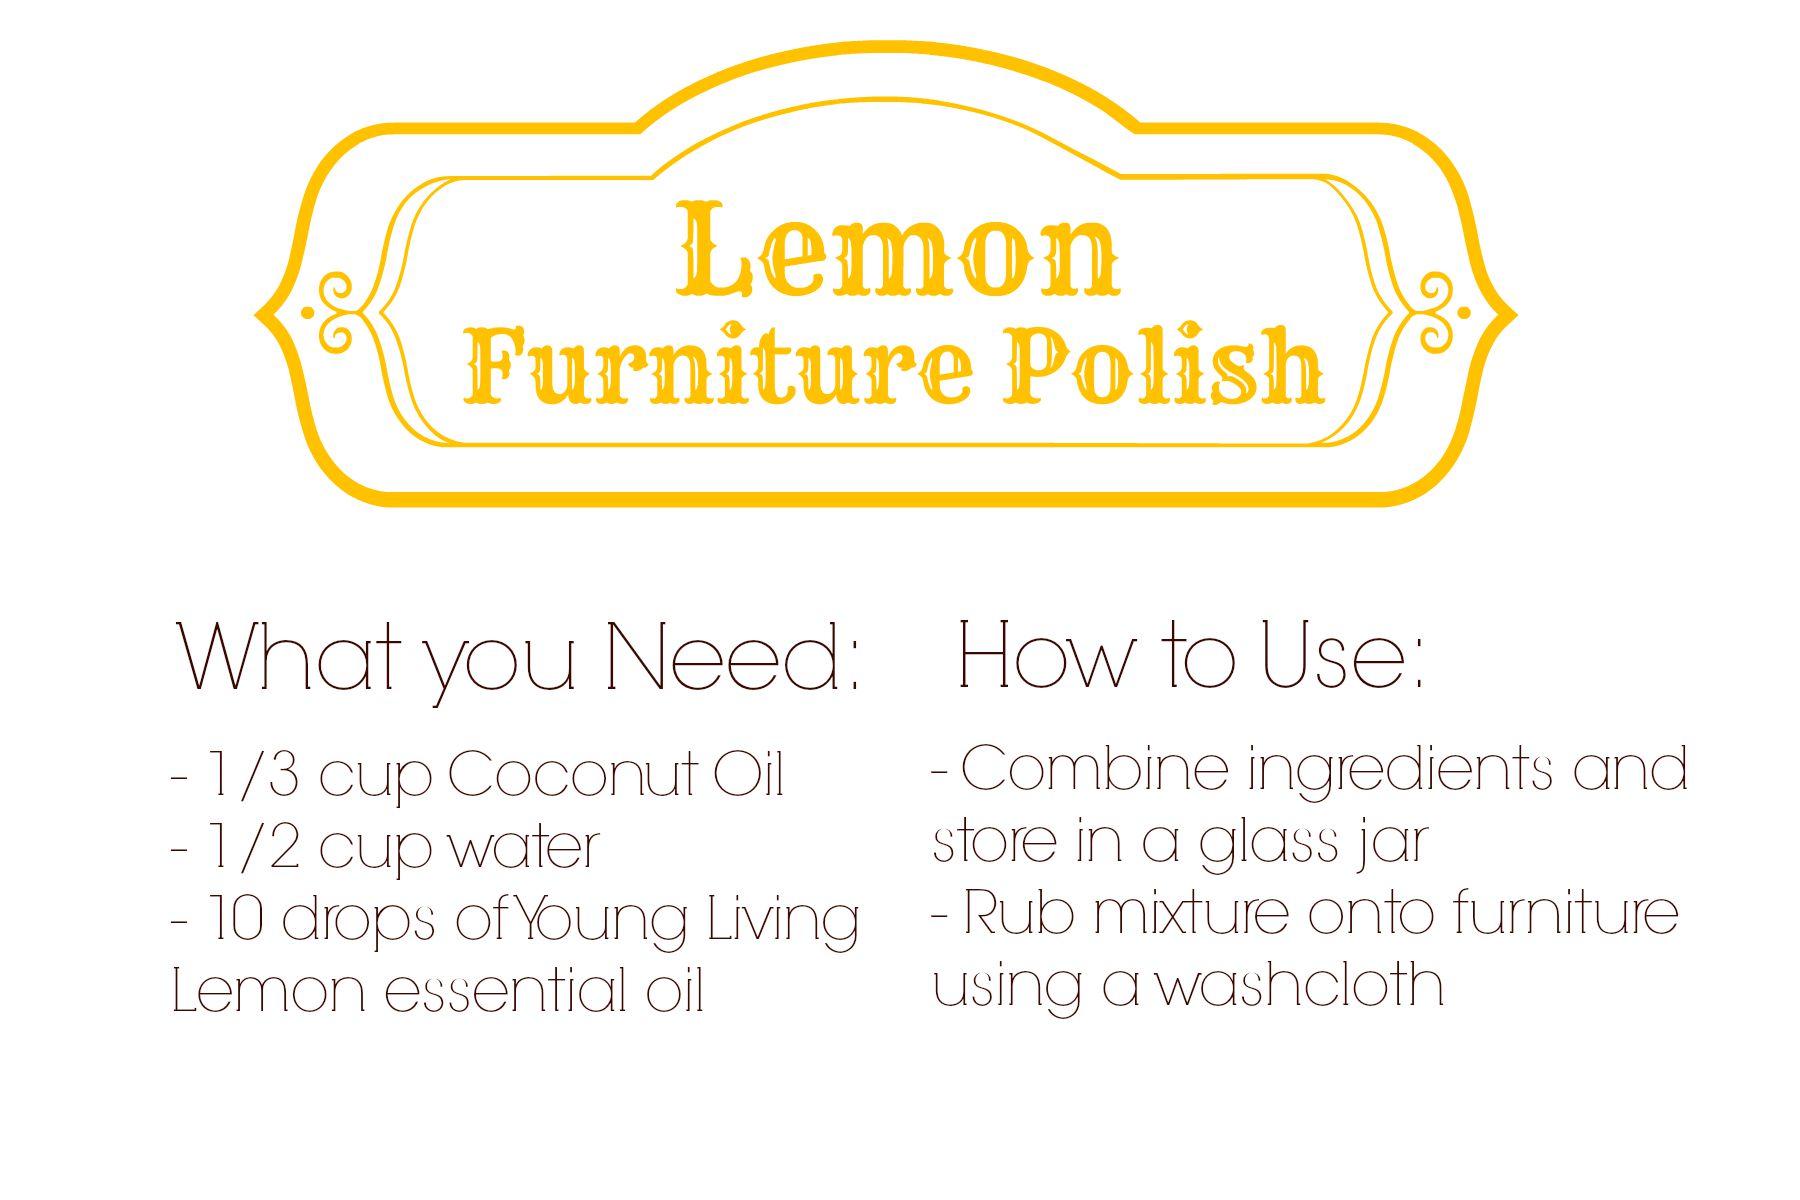 LemonFurniturePolish